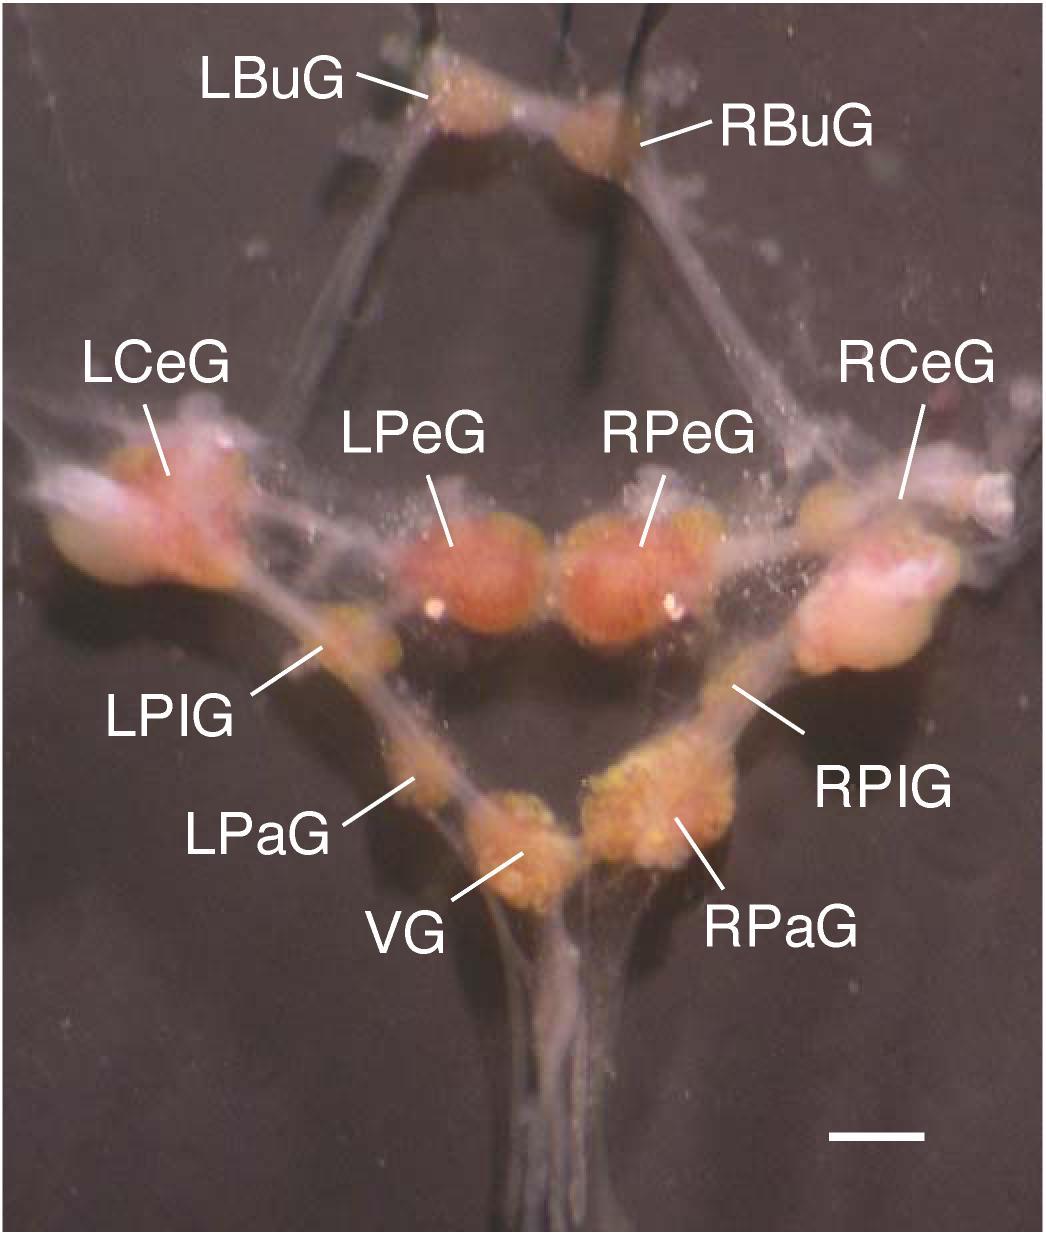 Gastropoda Nervous System